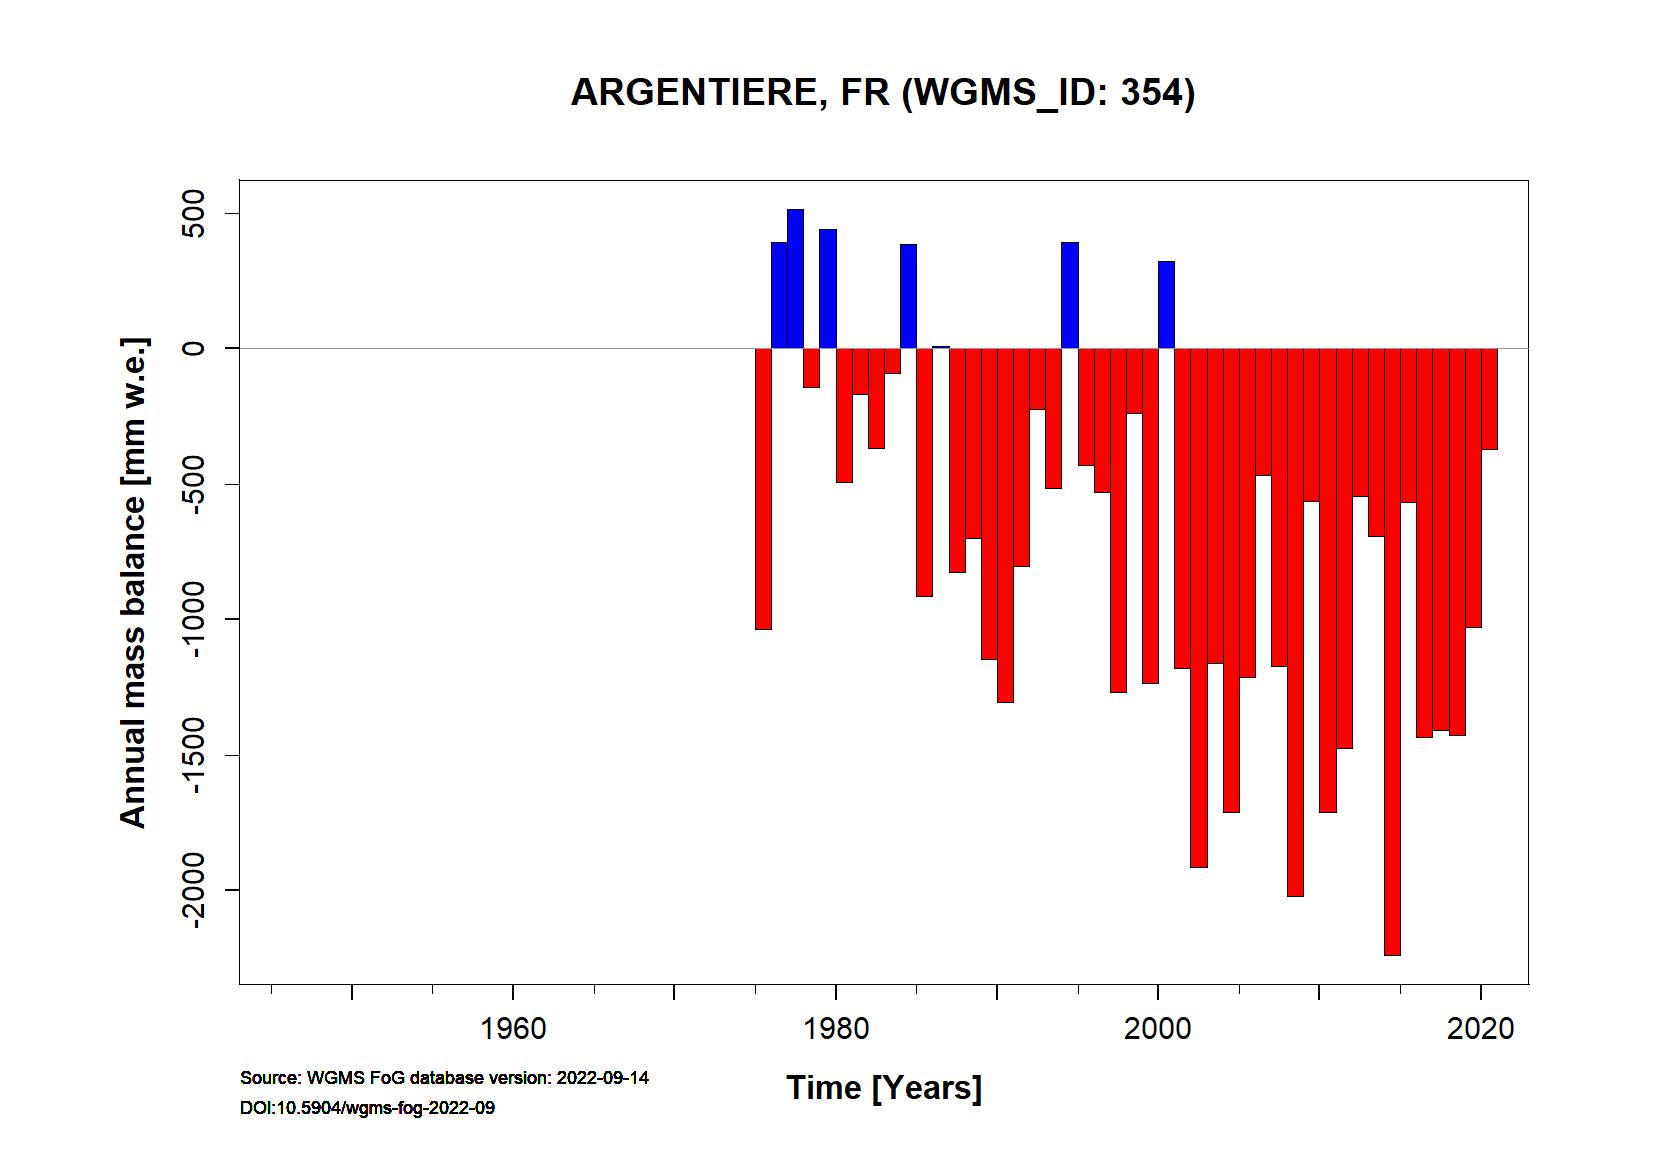 Argentieree glacier Annual Mass Balance (WGMS, 2015)